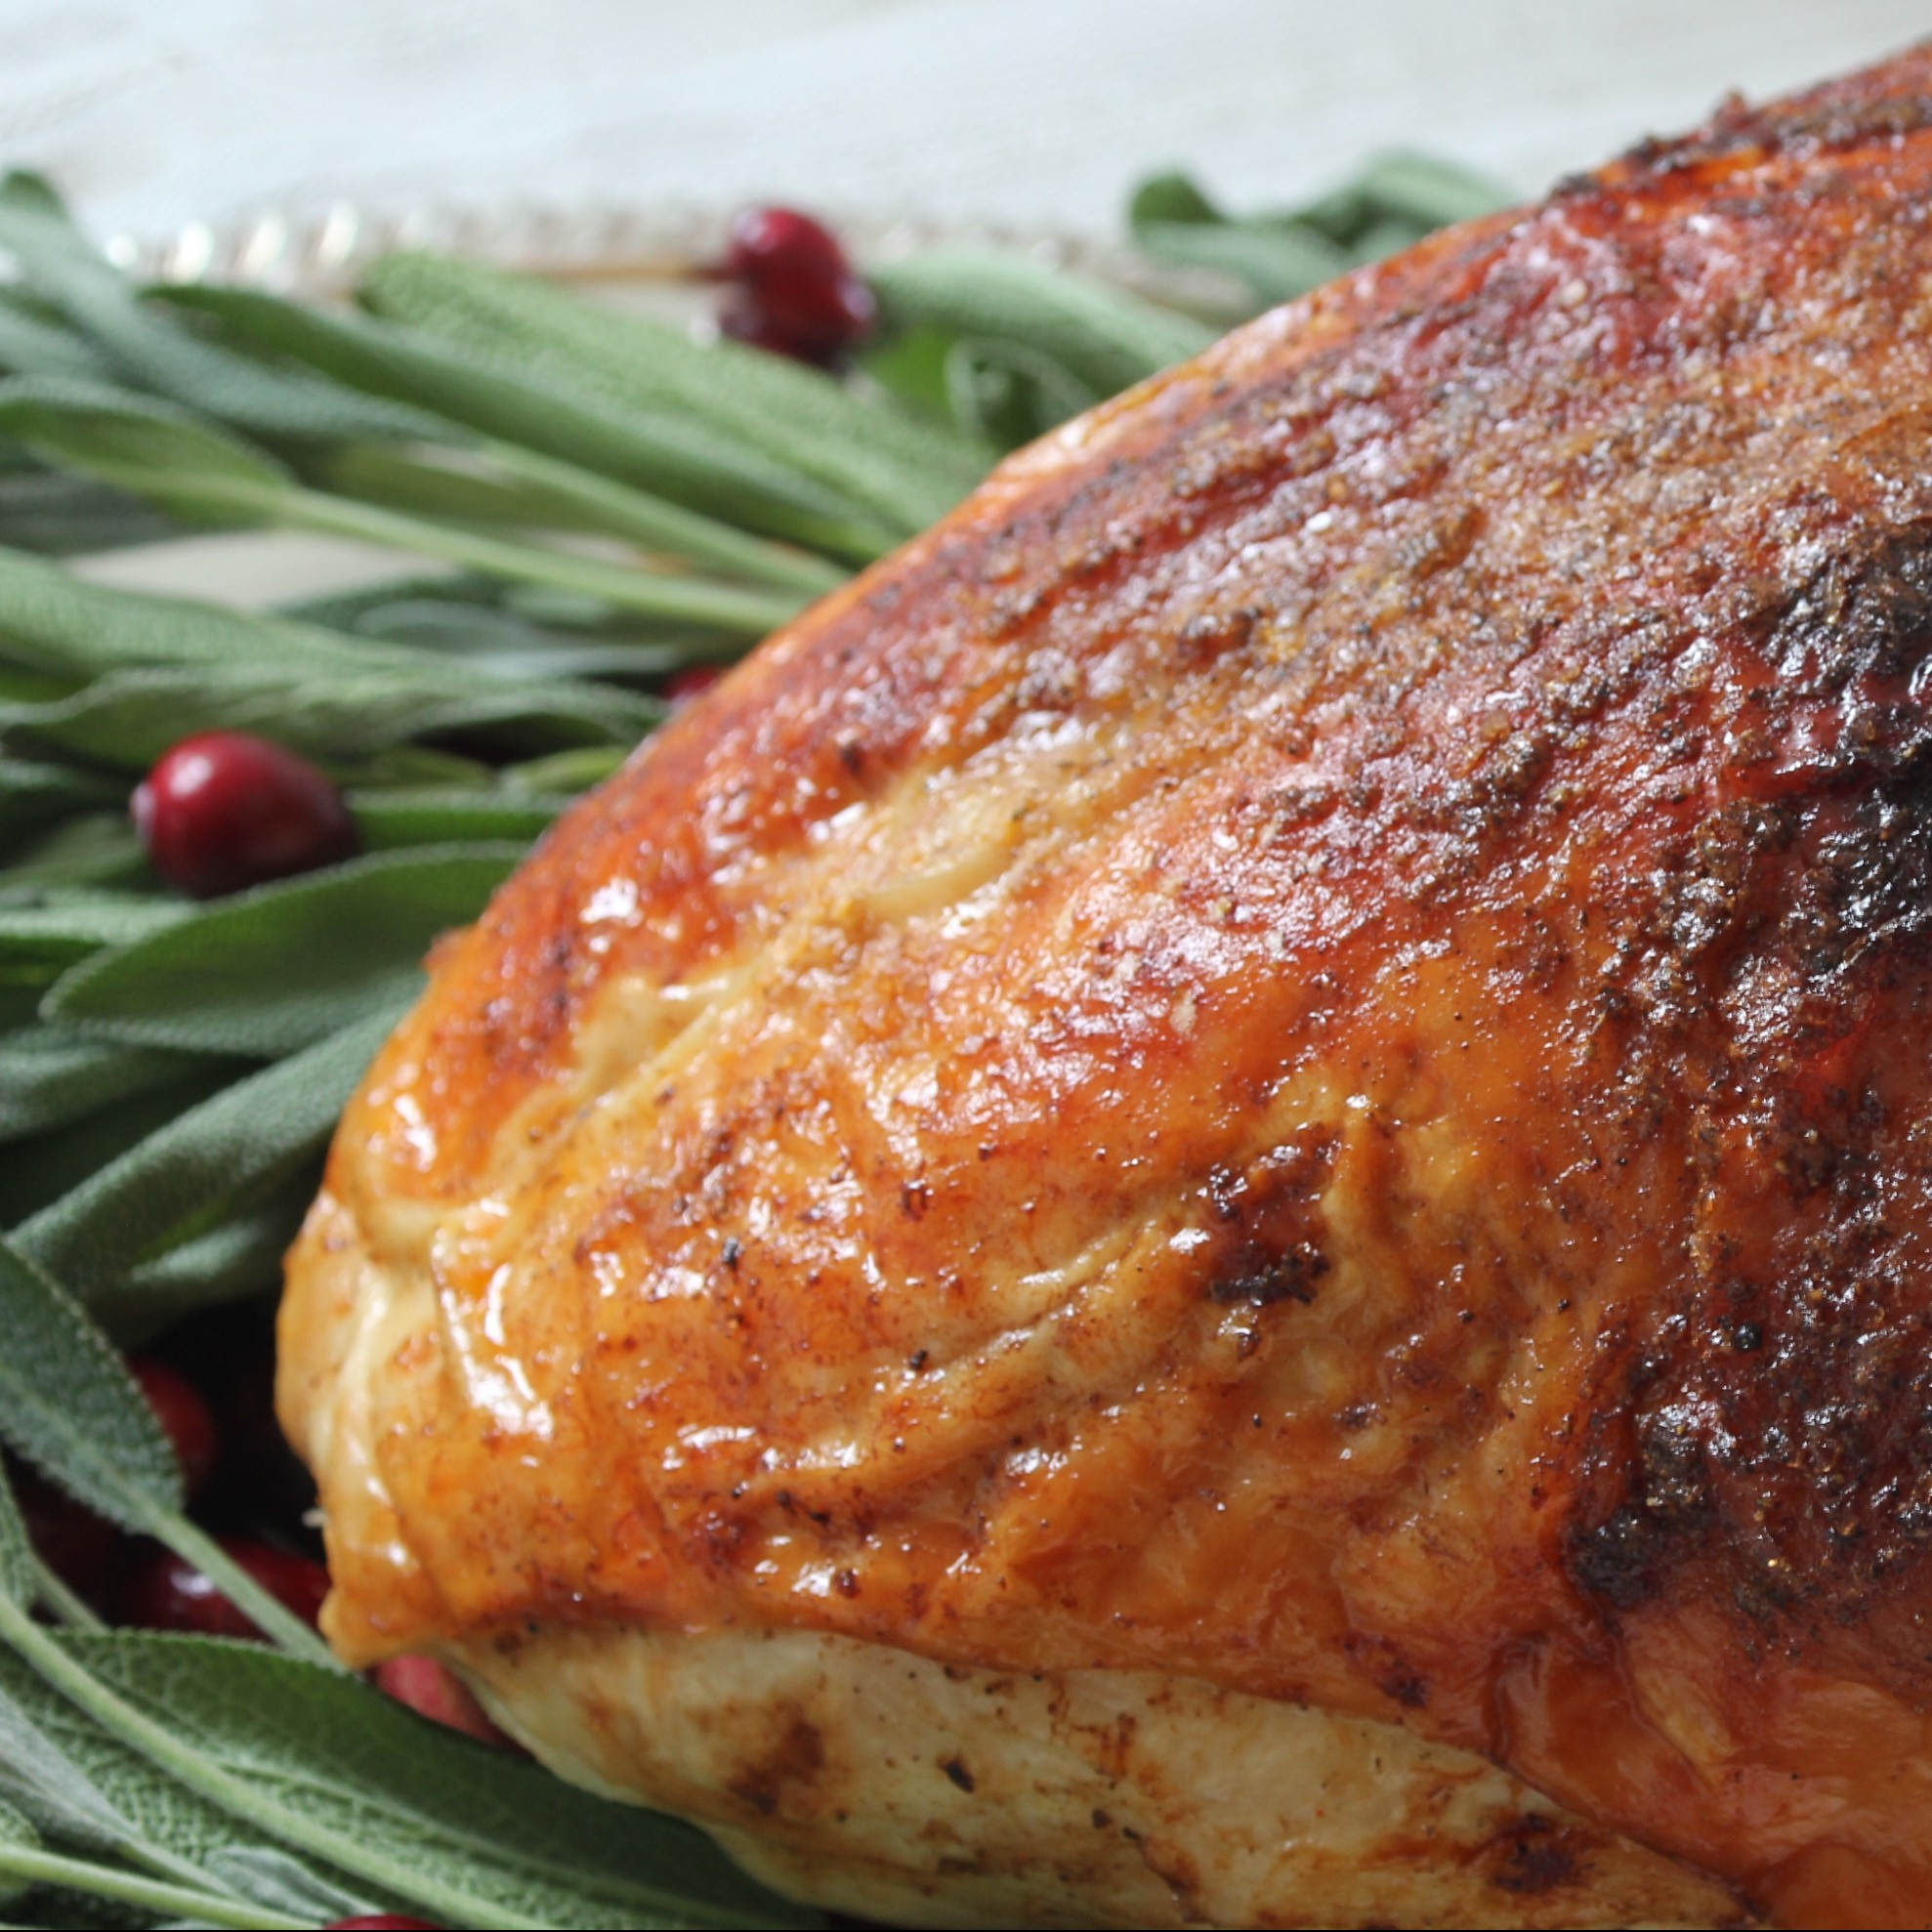 Roast-Turkey-Breast-with-Smoked-Sea-Salt-and-Brown-Sugar-Crust